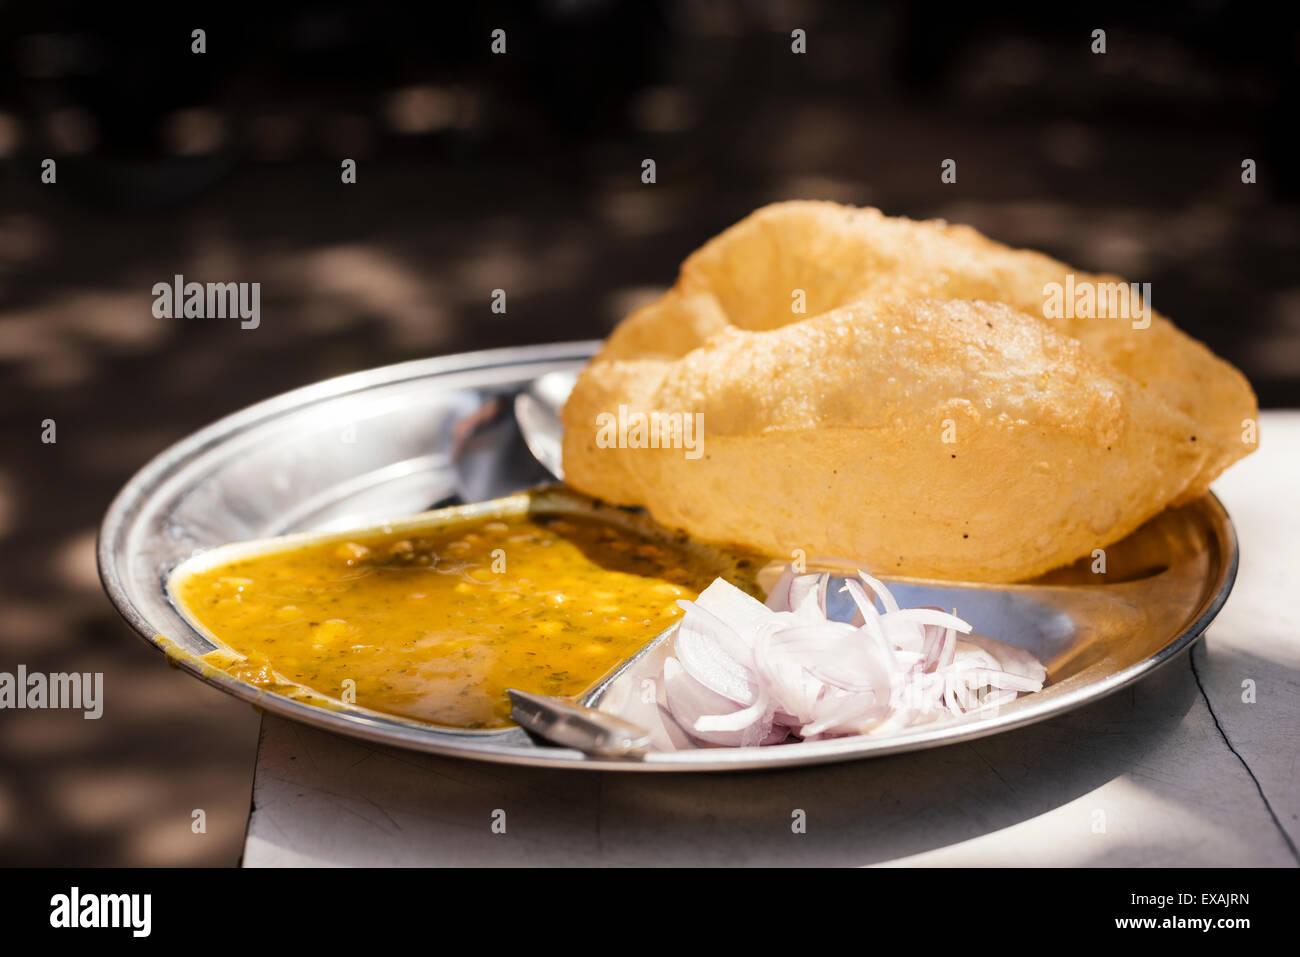 Chole Bhature piatto , settore 7, Chandigarh, Punjab e Haryana Province, India, Asia Immagini Stock